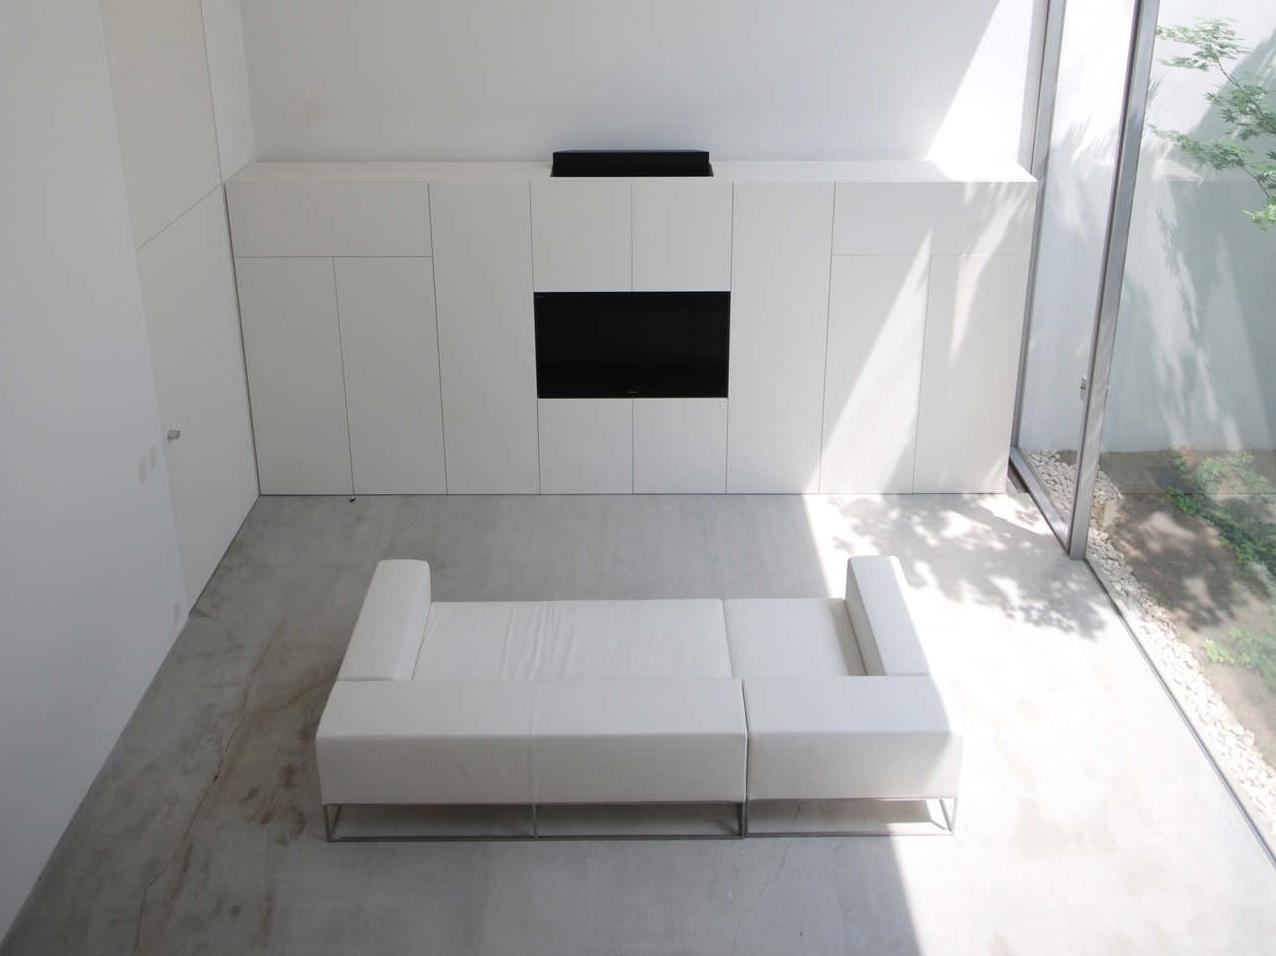 minimalist living room image inspiring | Zen Inspired Interior Design